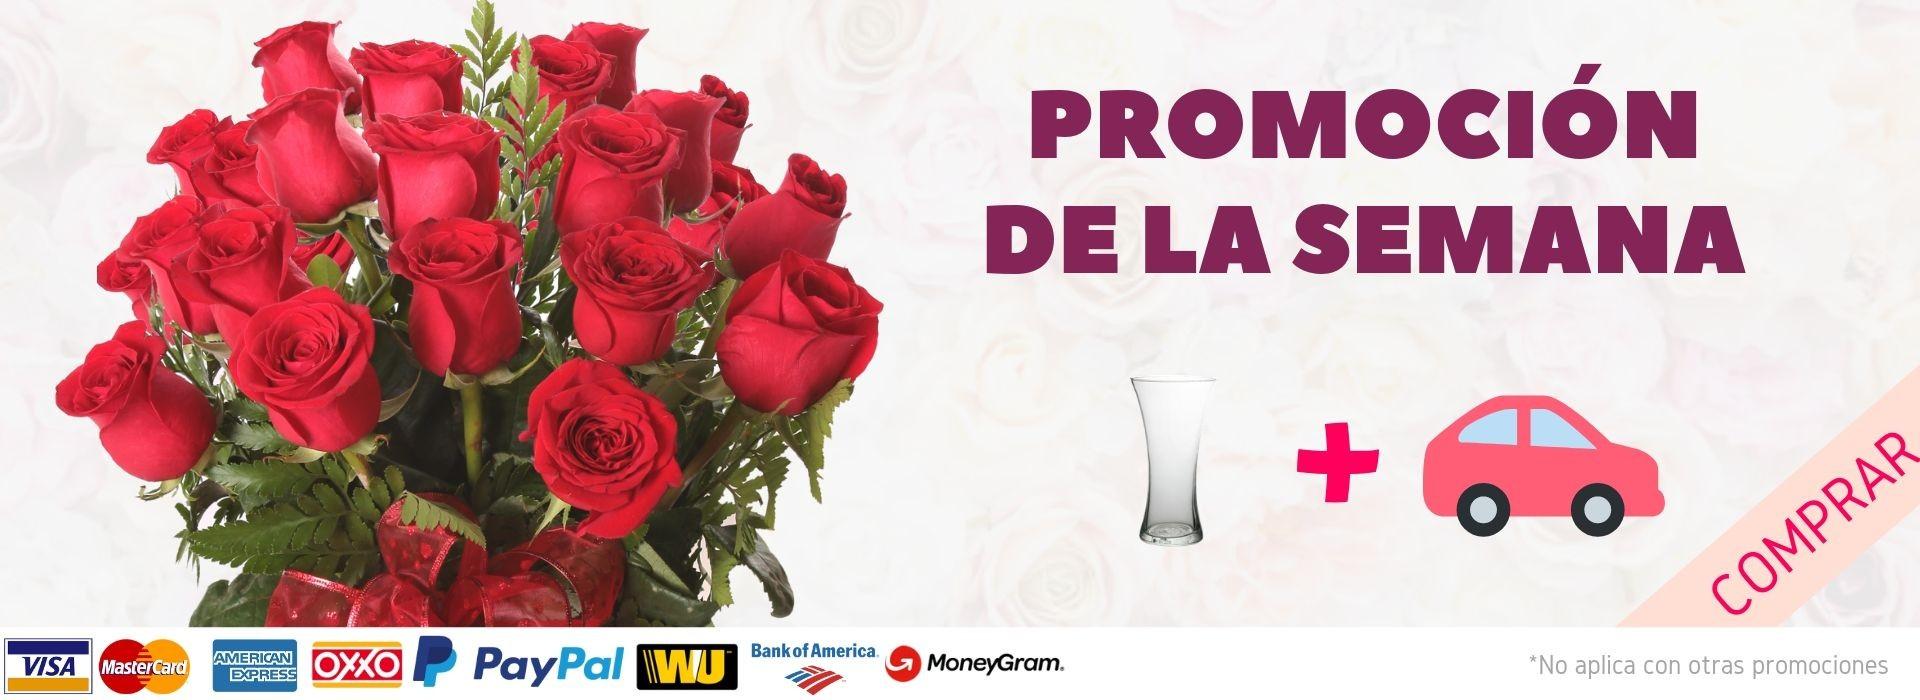 Flores Ramo de rosas en promoción